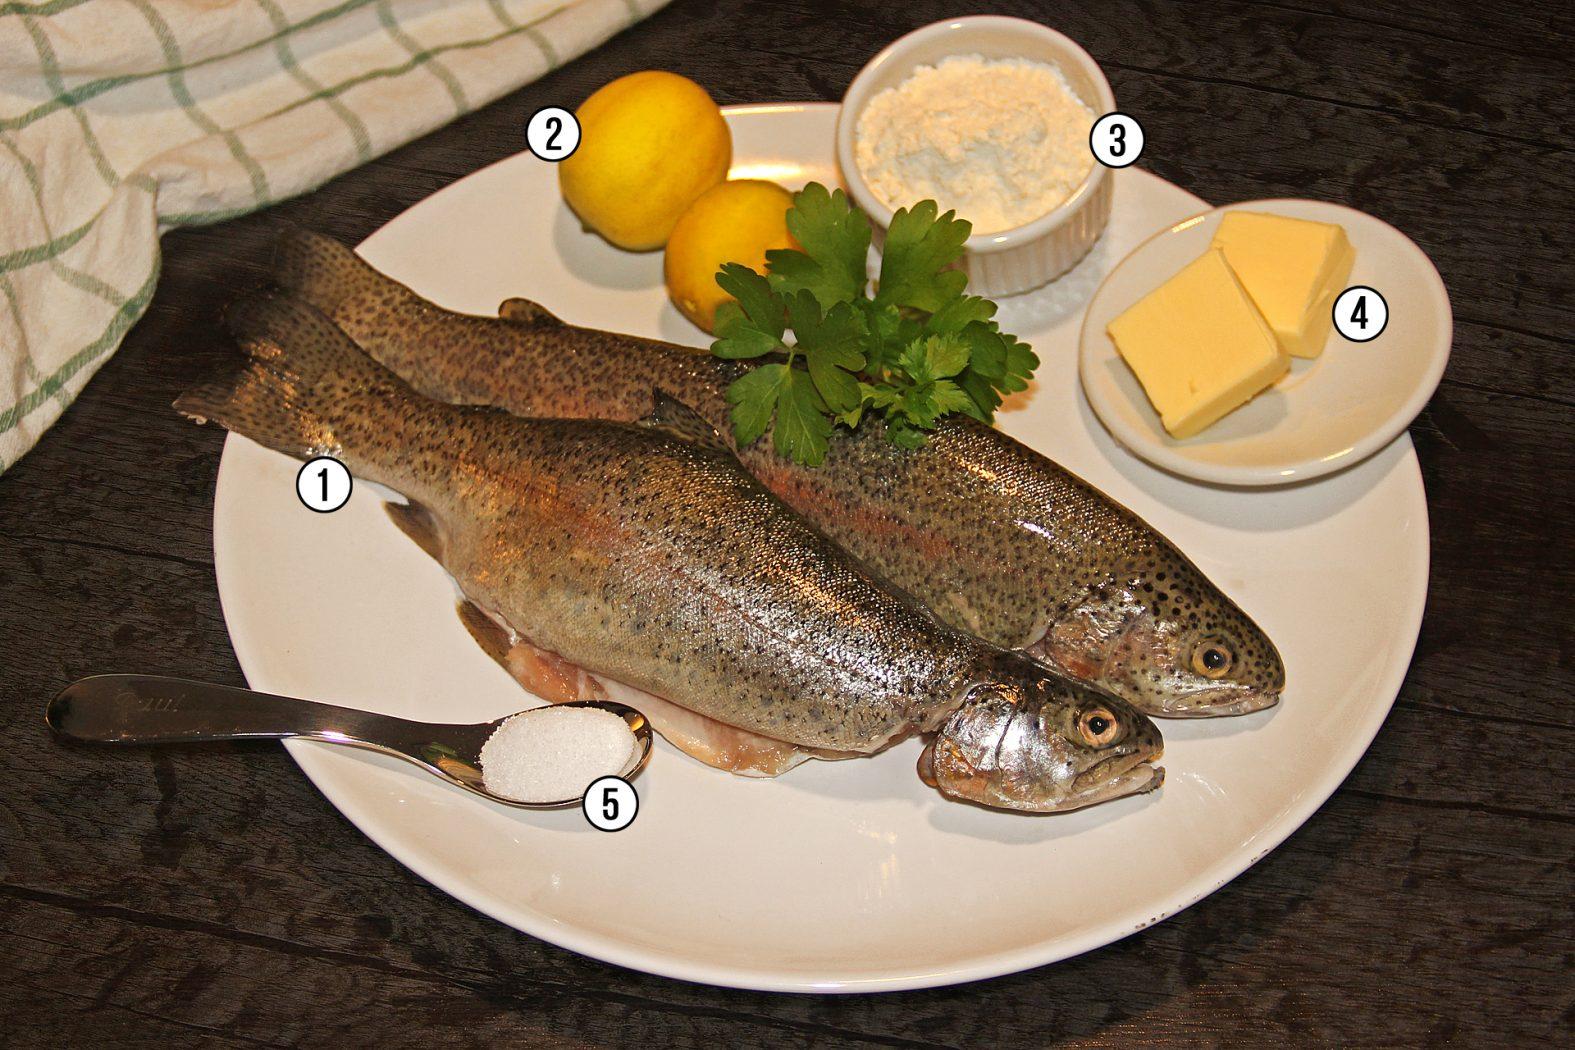 Leckeres Fischgericht: Forelle nach Müllerinart